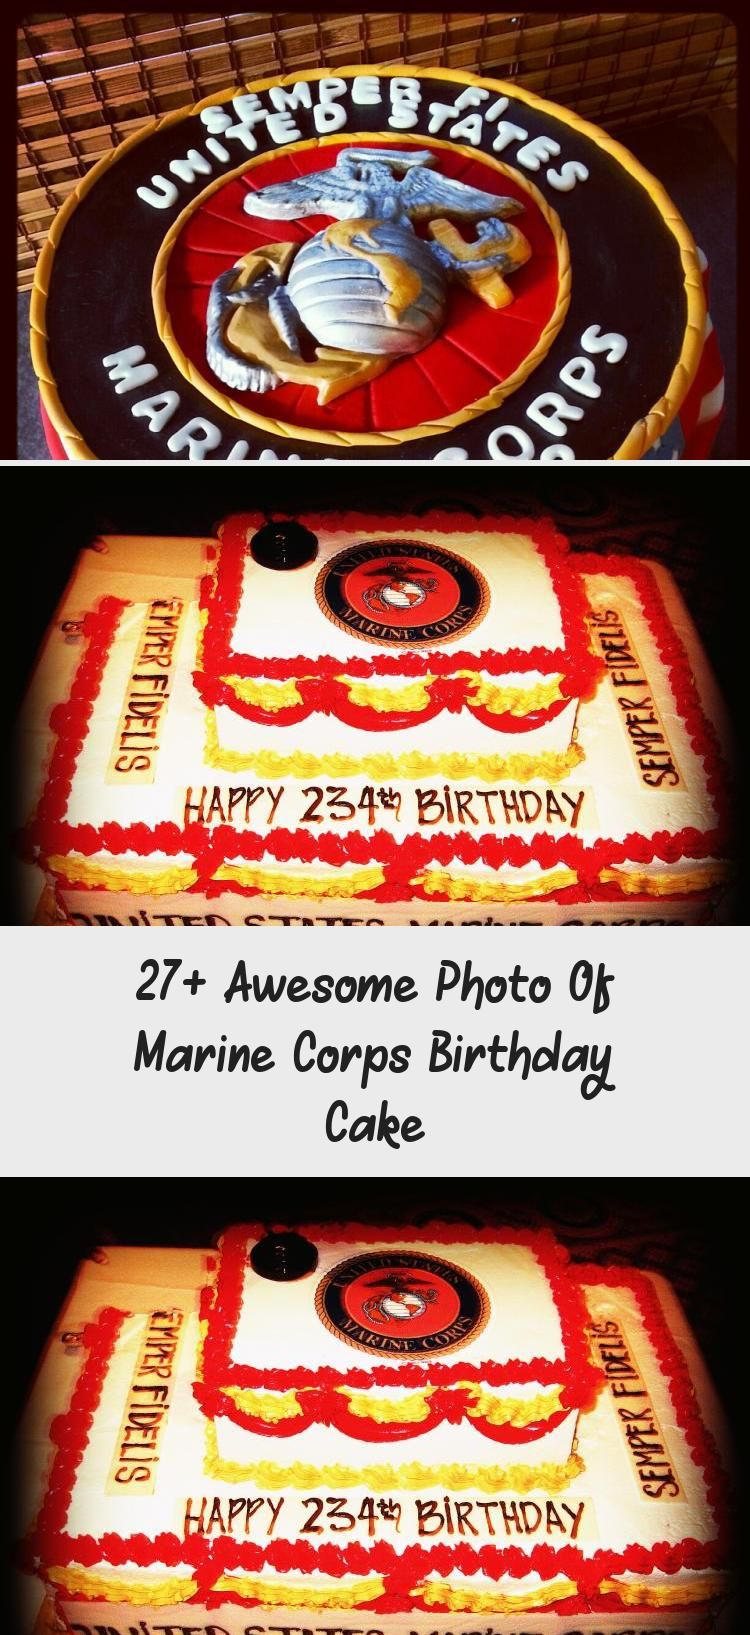 27+ Awesome Photo Of Marine Corps Birthday Cake Cake in